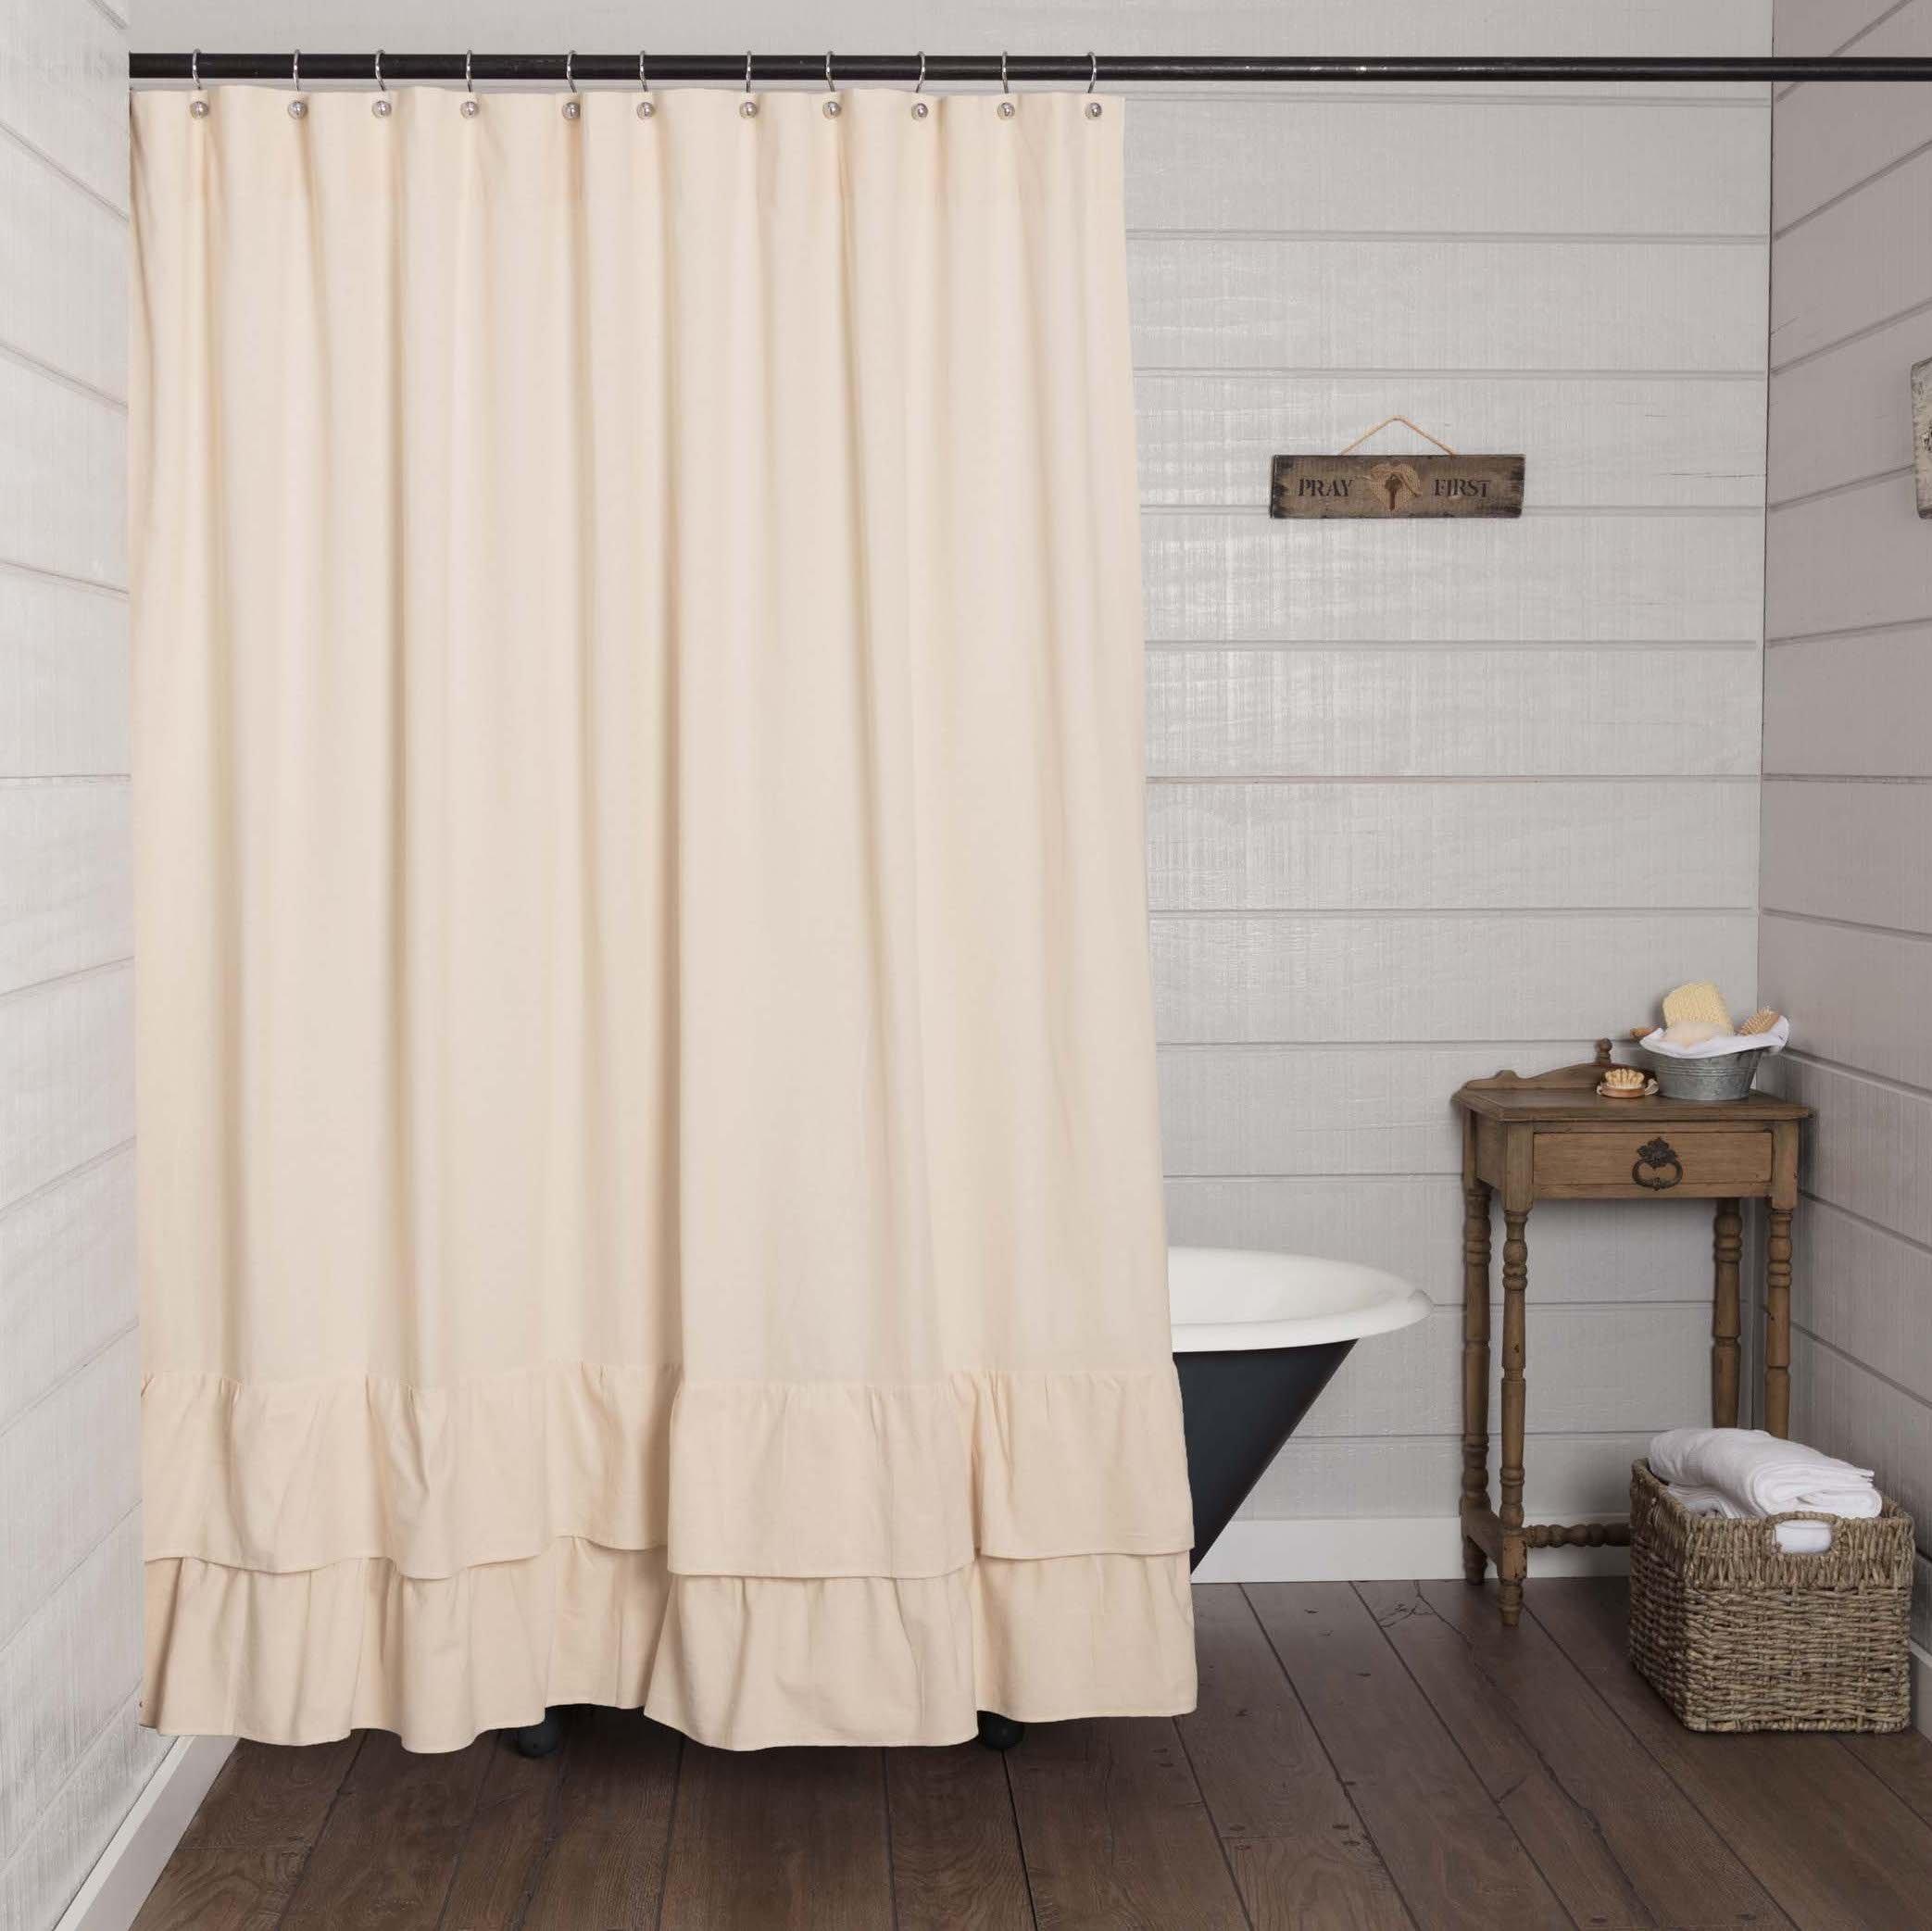 Piper Classics Ruffled Chambray Natural Shower Curtain, 72x72, Farmhouse Style